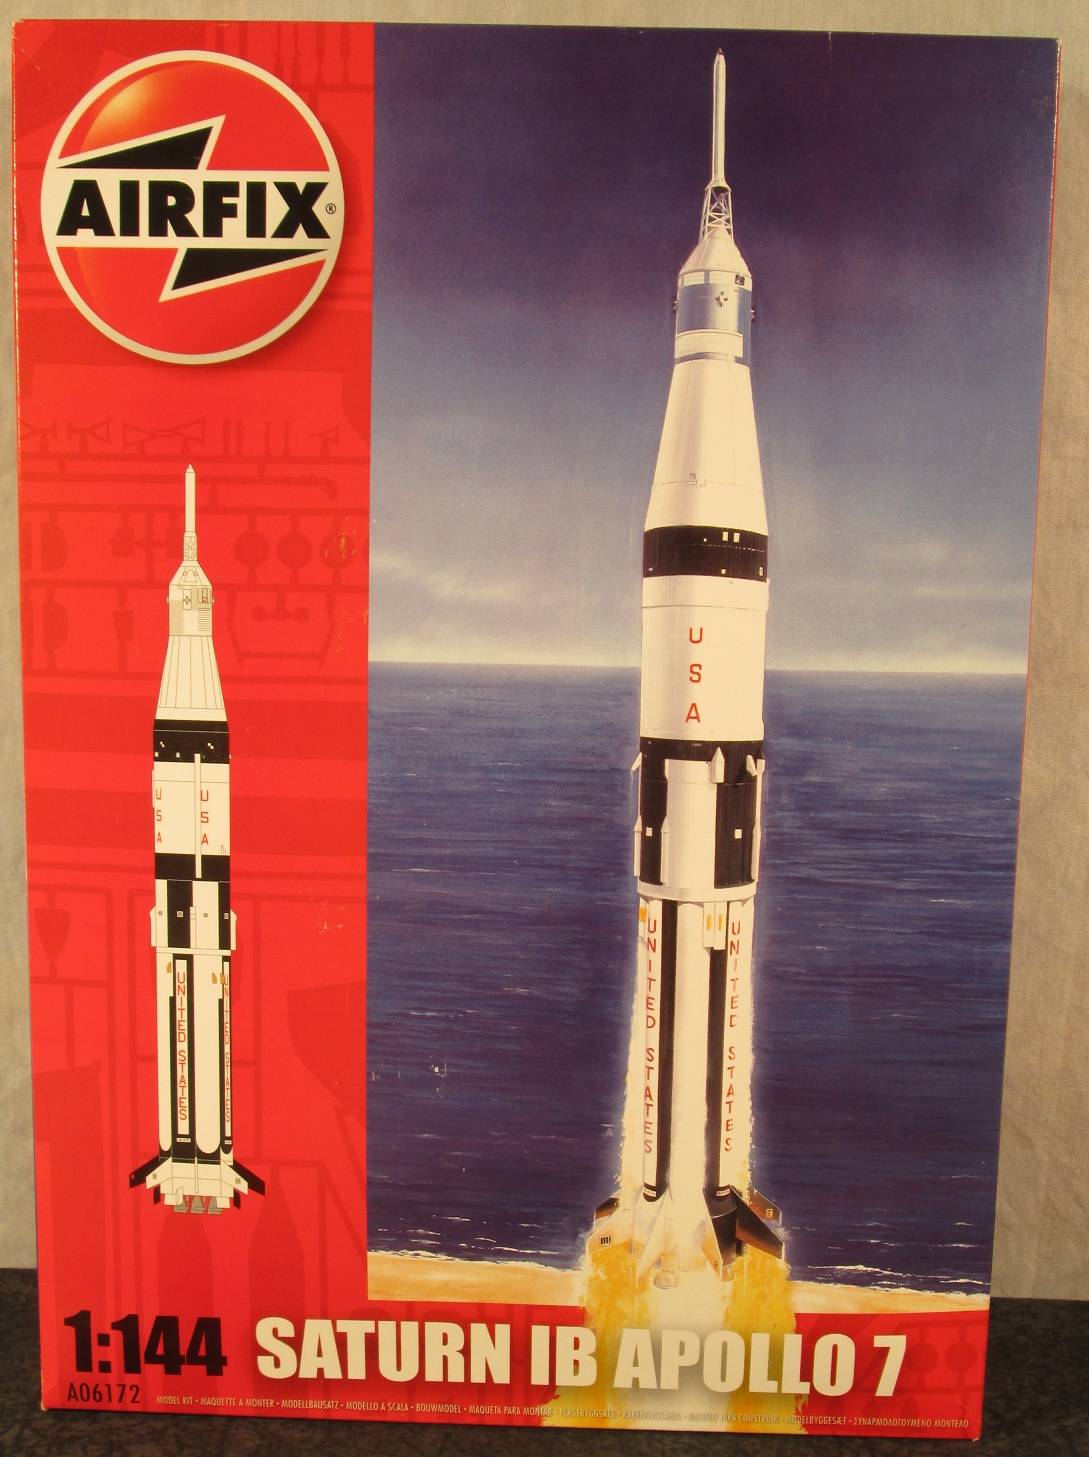 Airfix Nasa 1 144 Scale Saturn 1b Apollo 7 Rocket Afx 6172